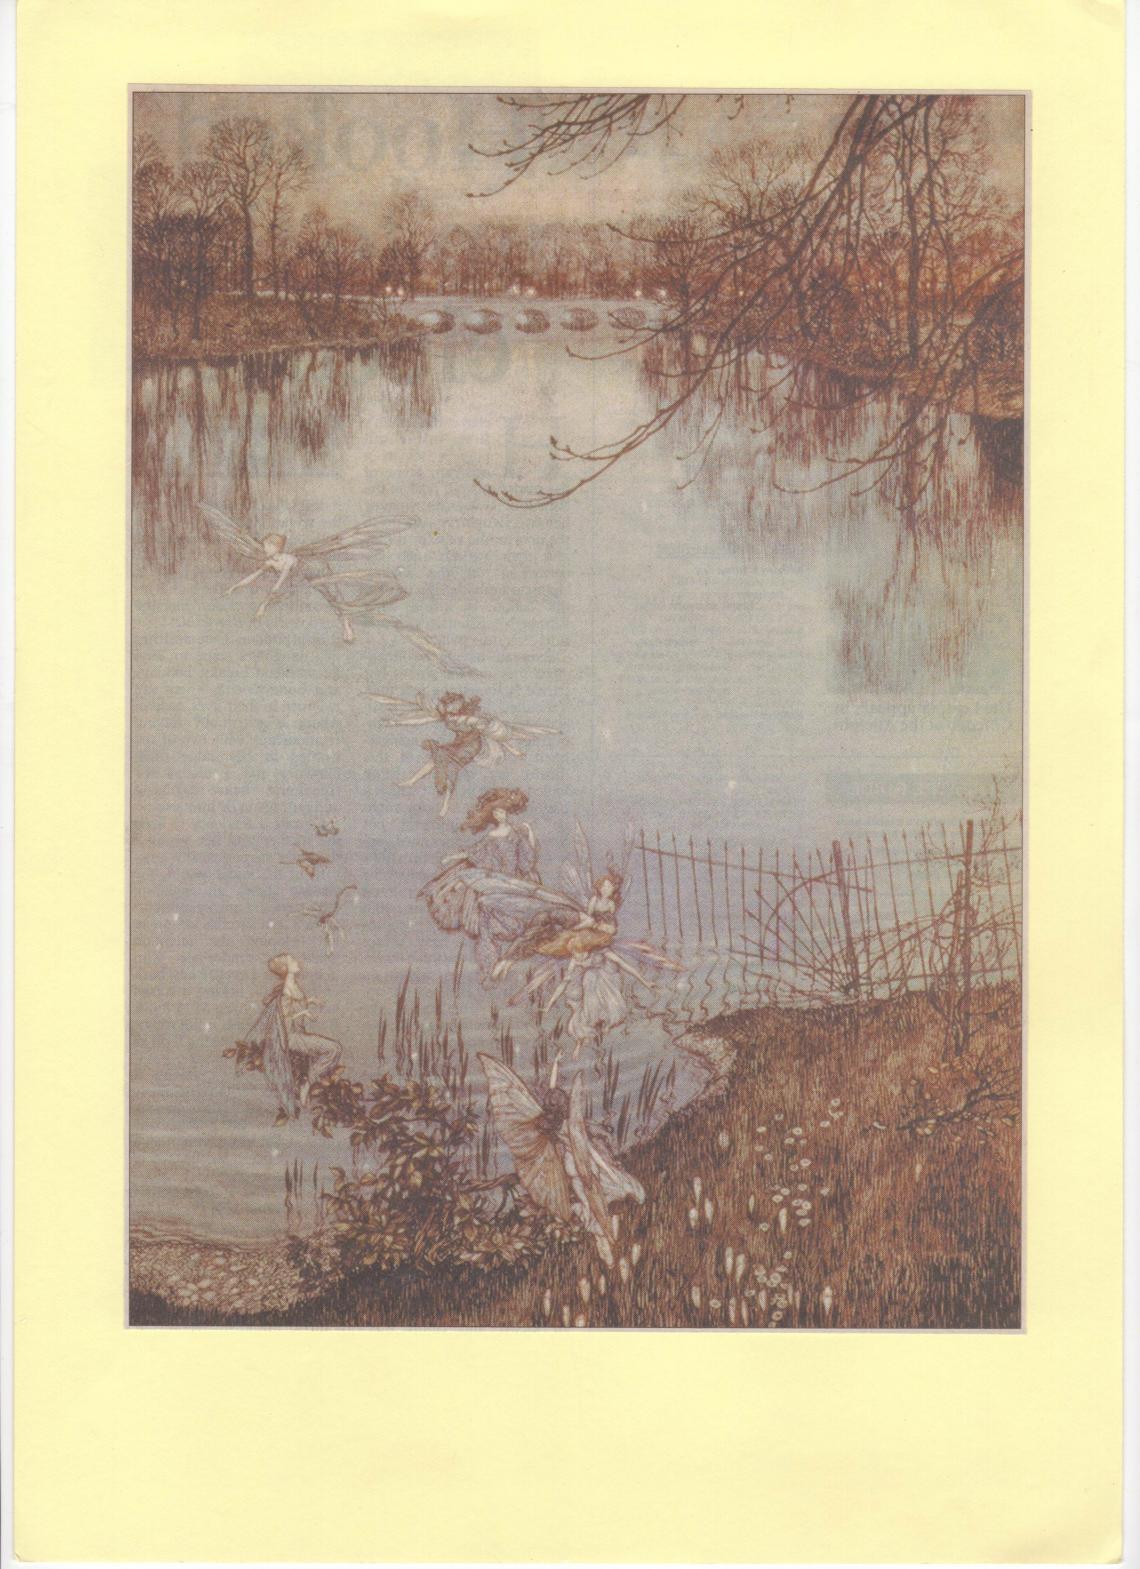 Fairies by the Long Water, Kensington Gardens